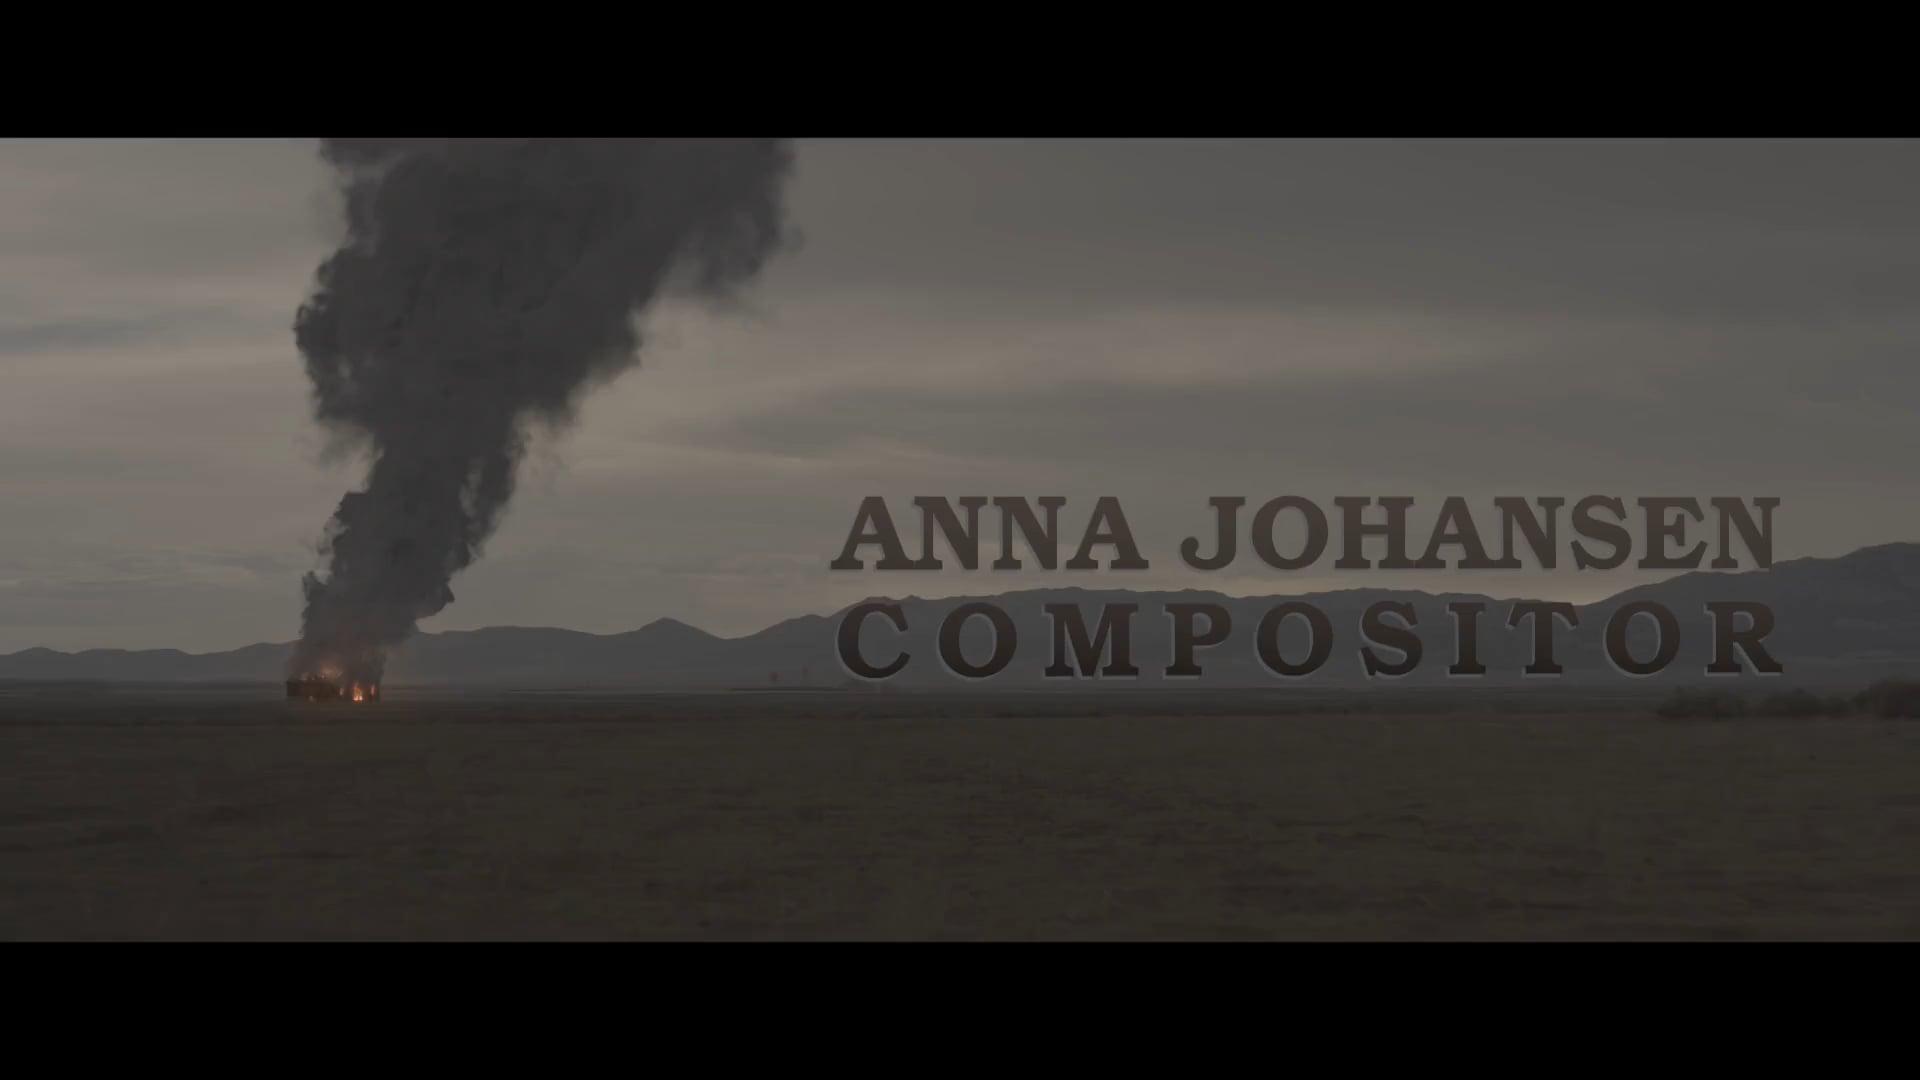 DEMO REEL - LBS 029 - ANNA JOHANSEN